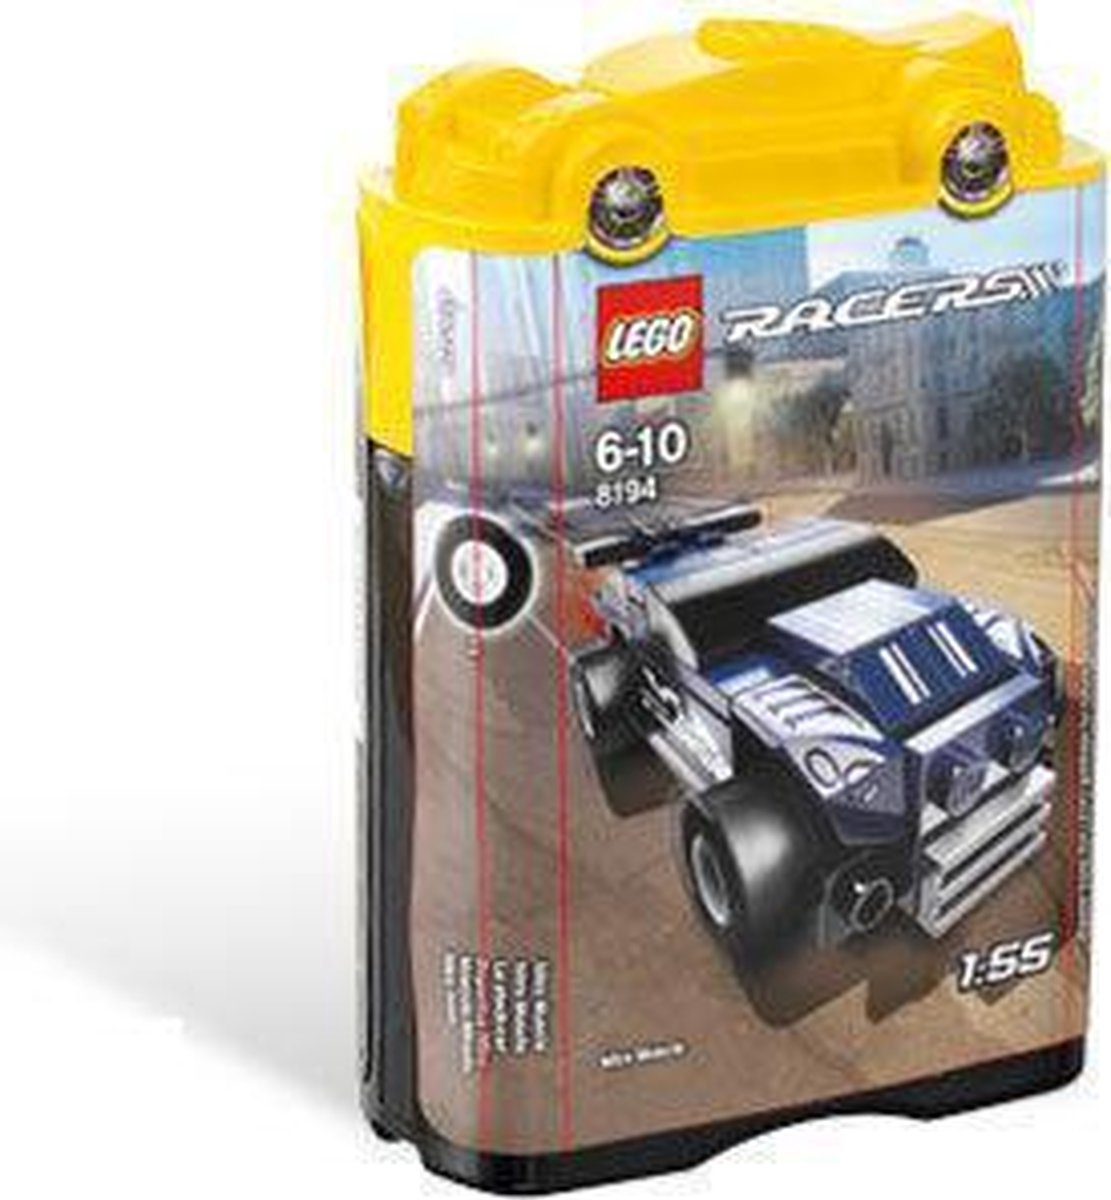 LEGO Racers Nitro Muscle - 8194